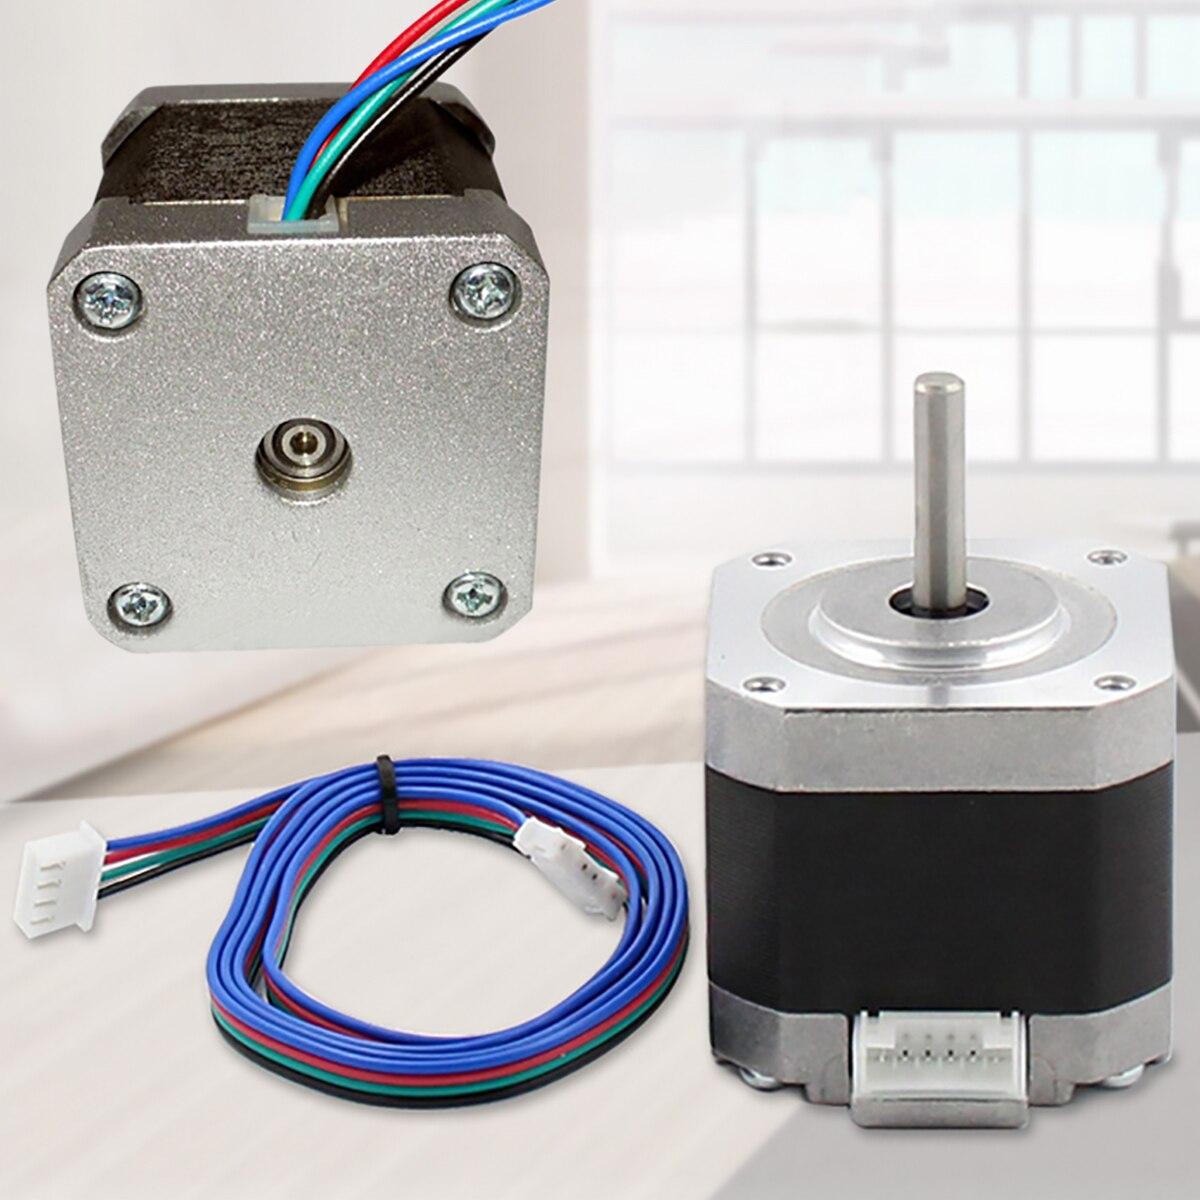 Durable NEMA17 42mm 2 Phase 4-wire Stepper Motor 5W 1.8 Degree 0-1500 RPM For 3D Printer CNC Robot Stage Lighting Mayitr nema17 1 8 degree 42mm 2 phase stepper motor fit adapter drive jk0220 for 3d printer cnc jk42hs40 1704